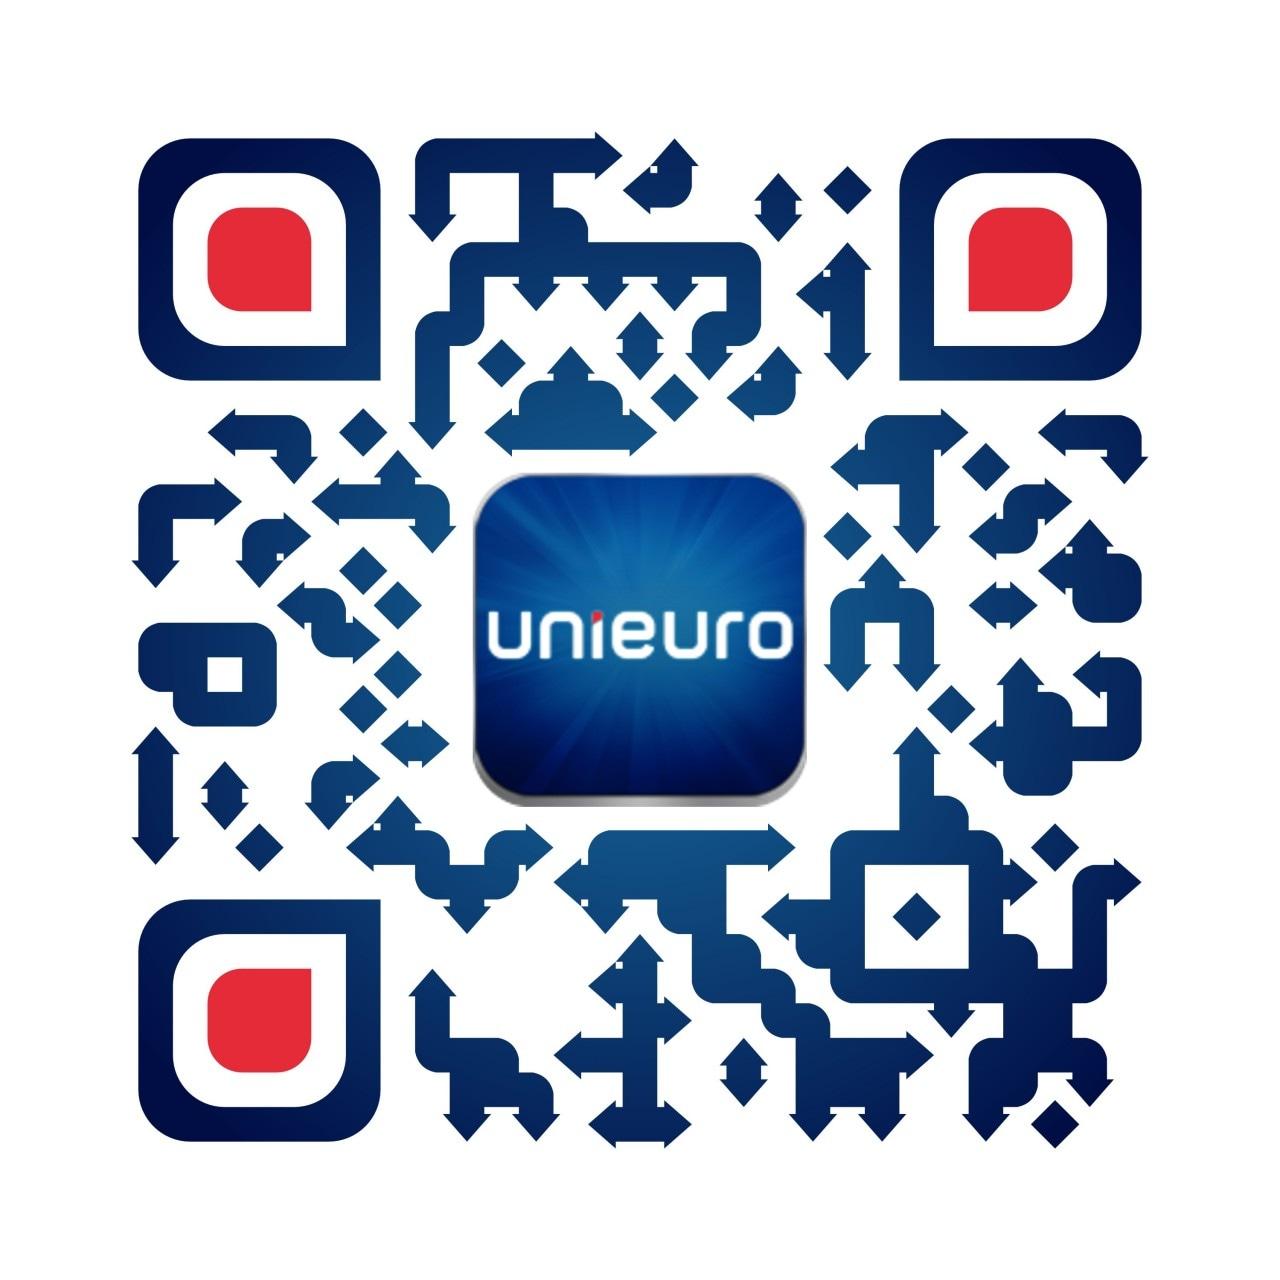 QRcode Unieuro